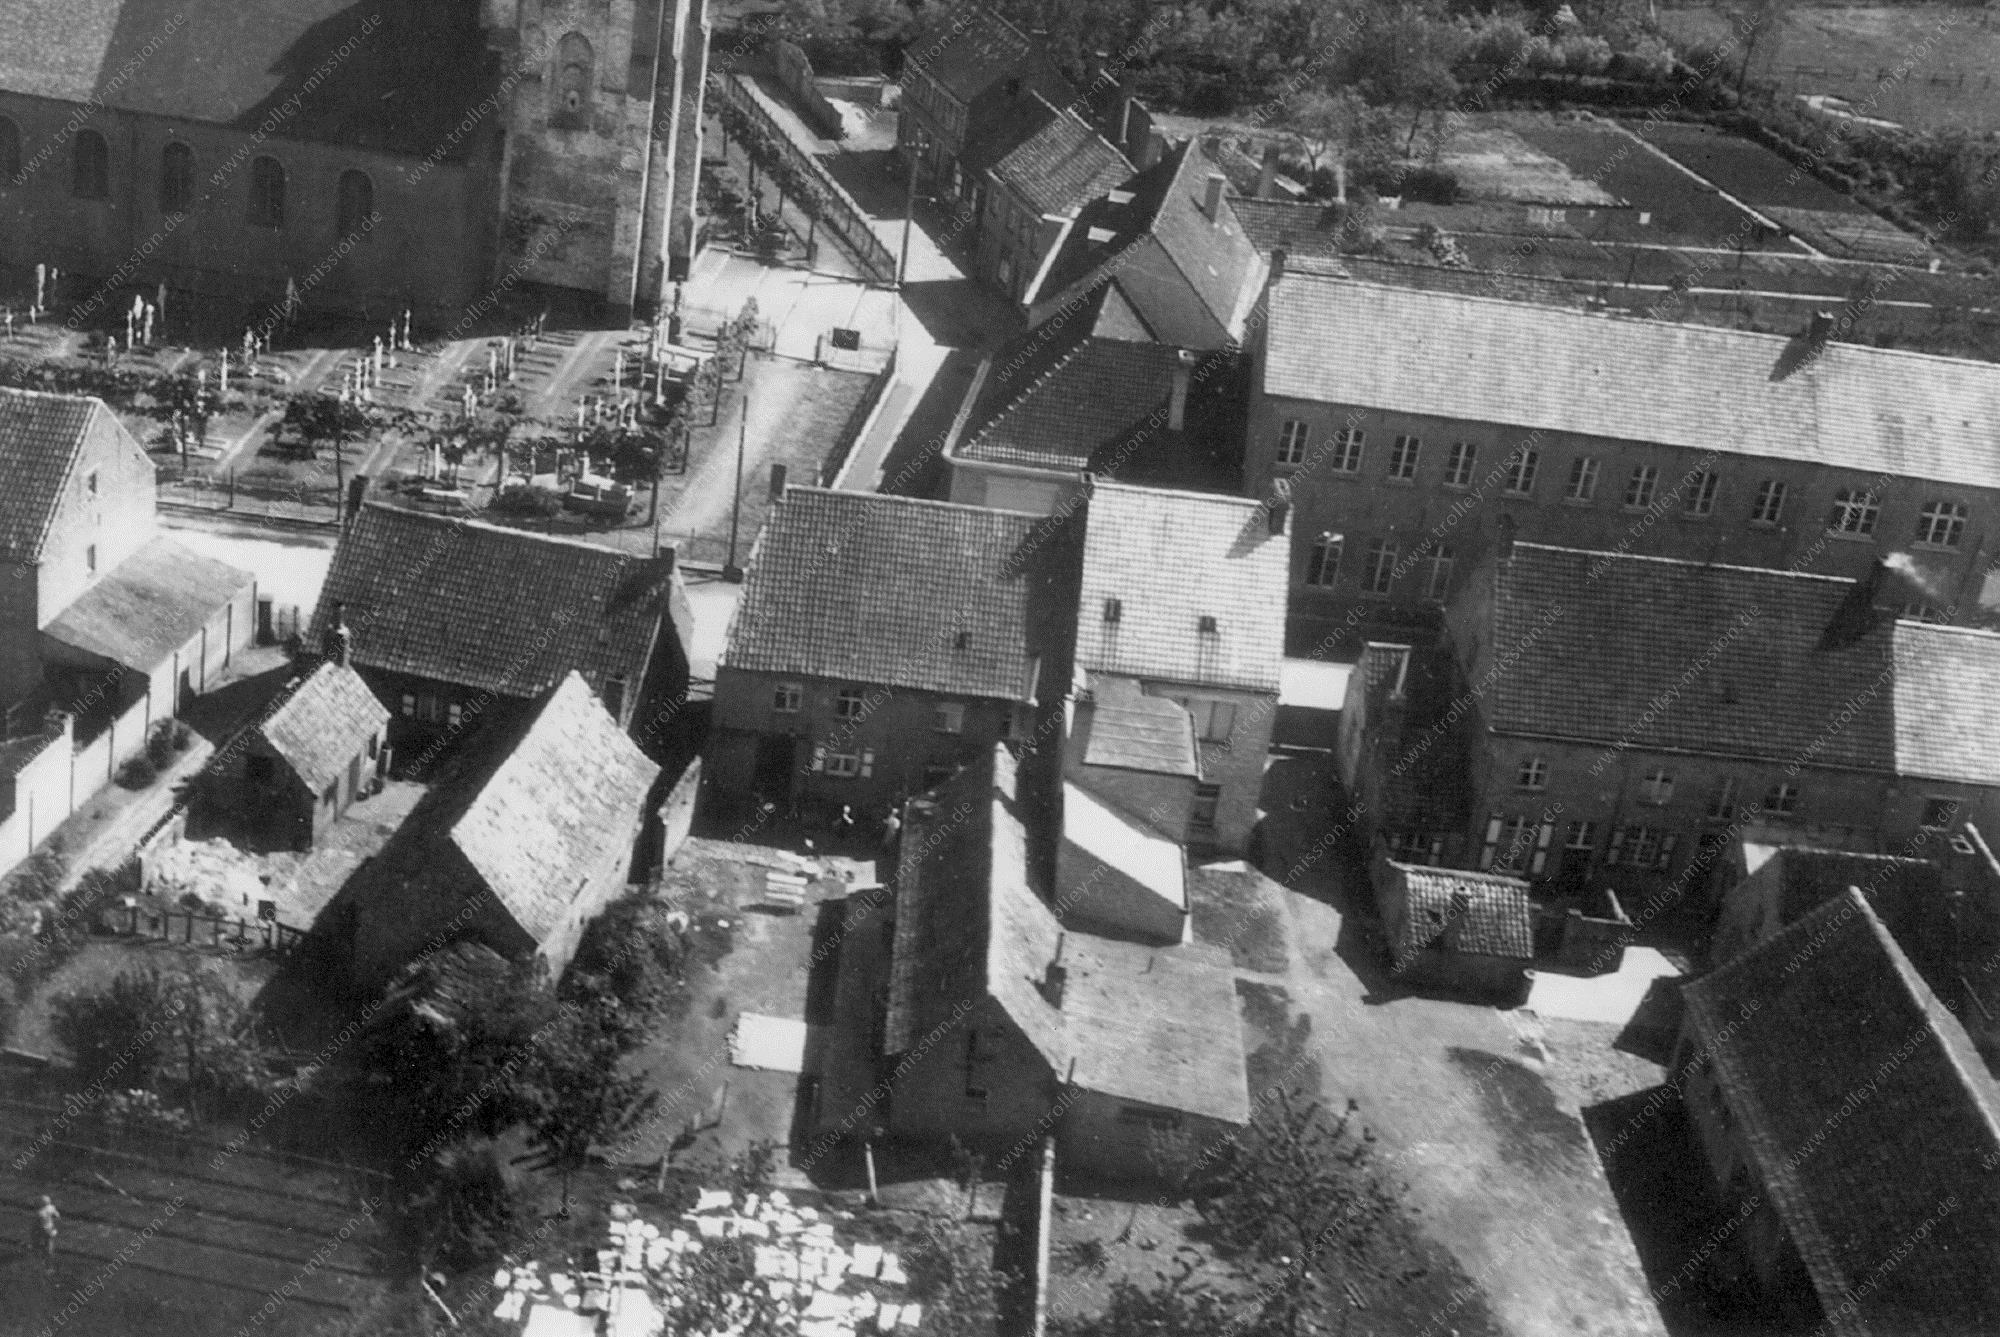 Zedelgem Luftbild Kirche Sankt Laurenzius aus dem Zweiten Weltkrieg (Belgien)